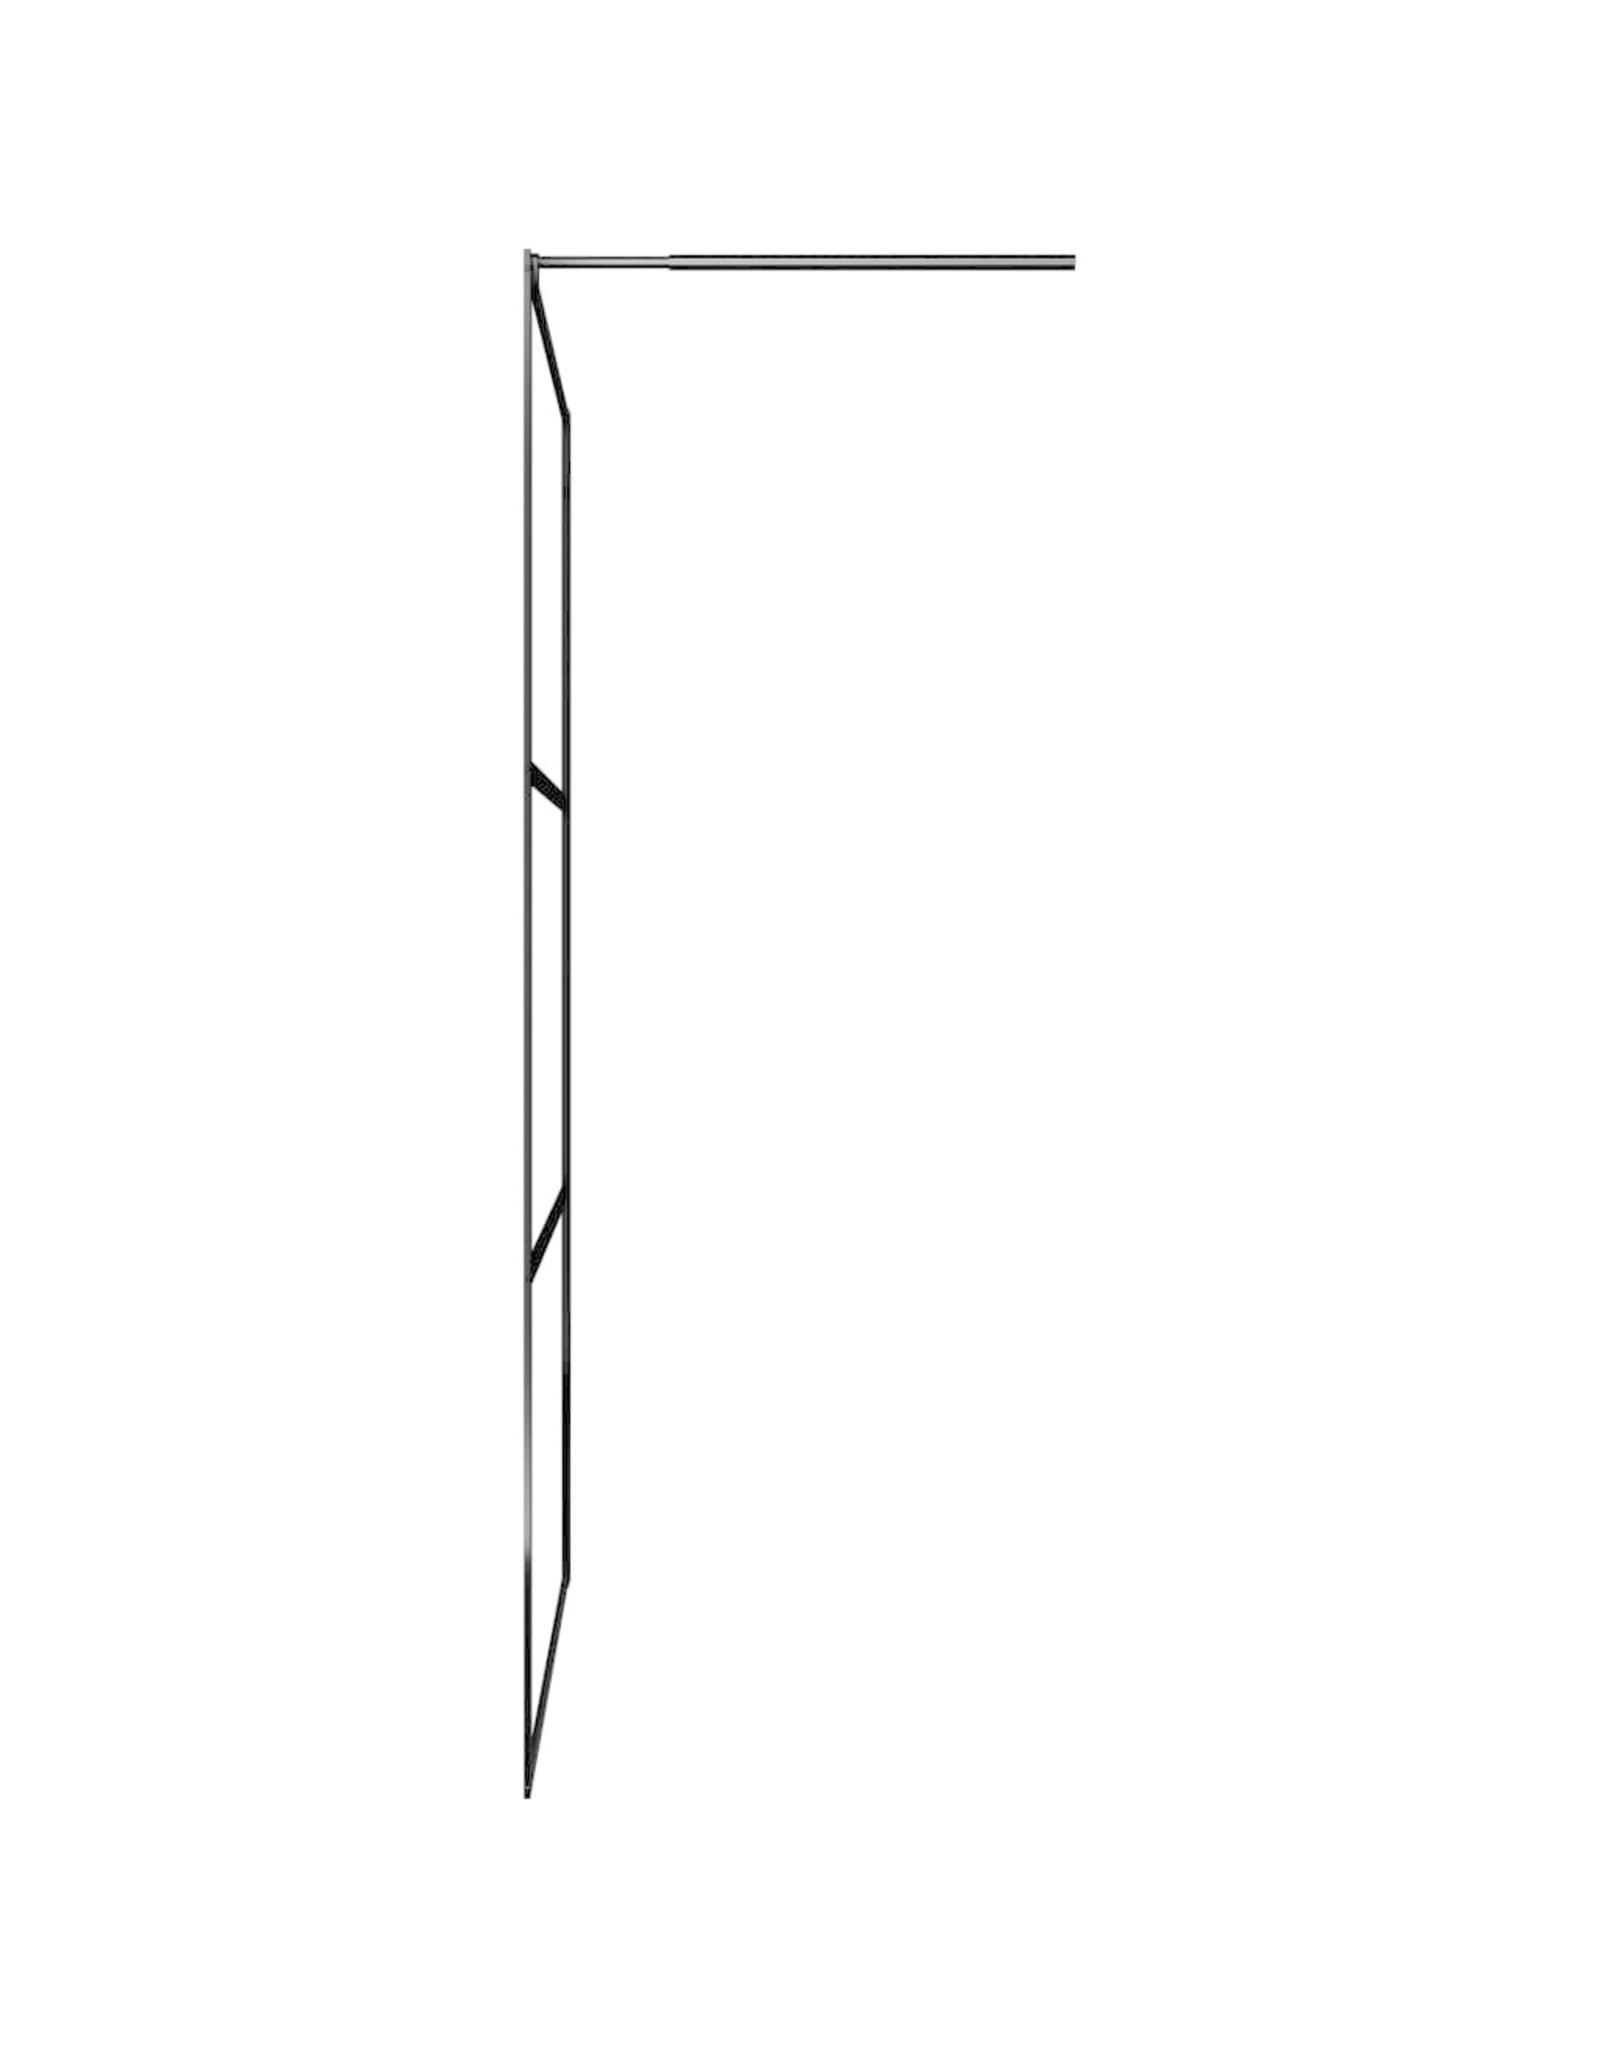 Inloopdouchewand transparant 100x195 cm ESG-glas zwart